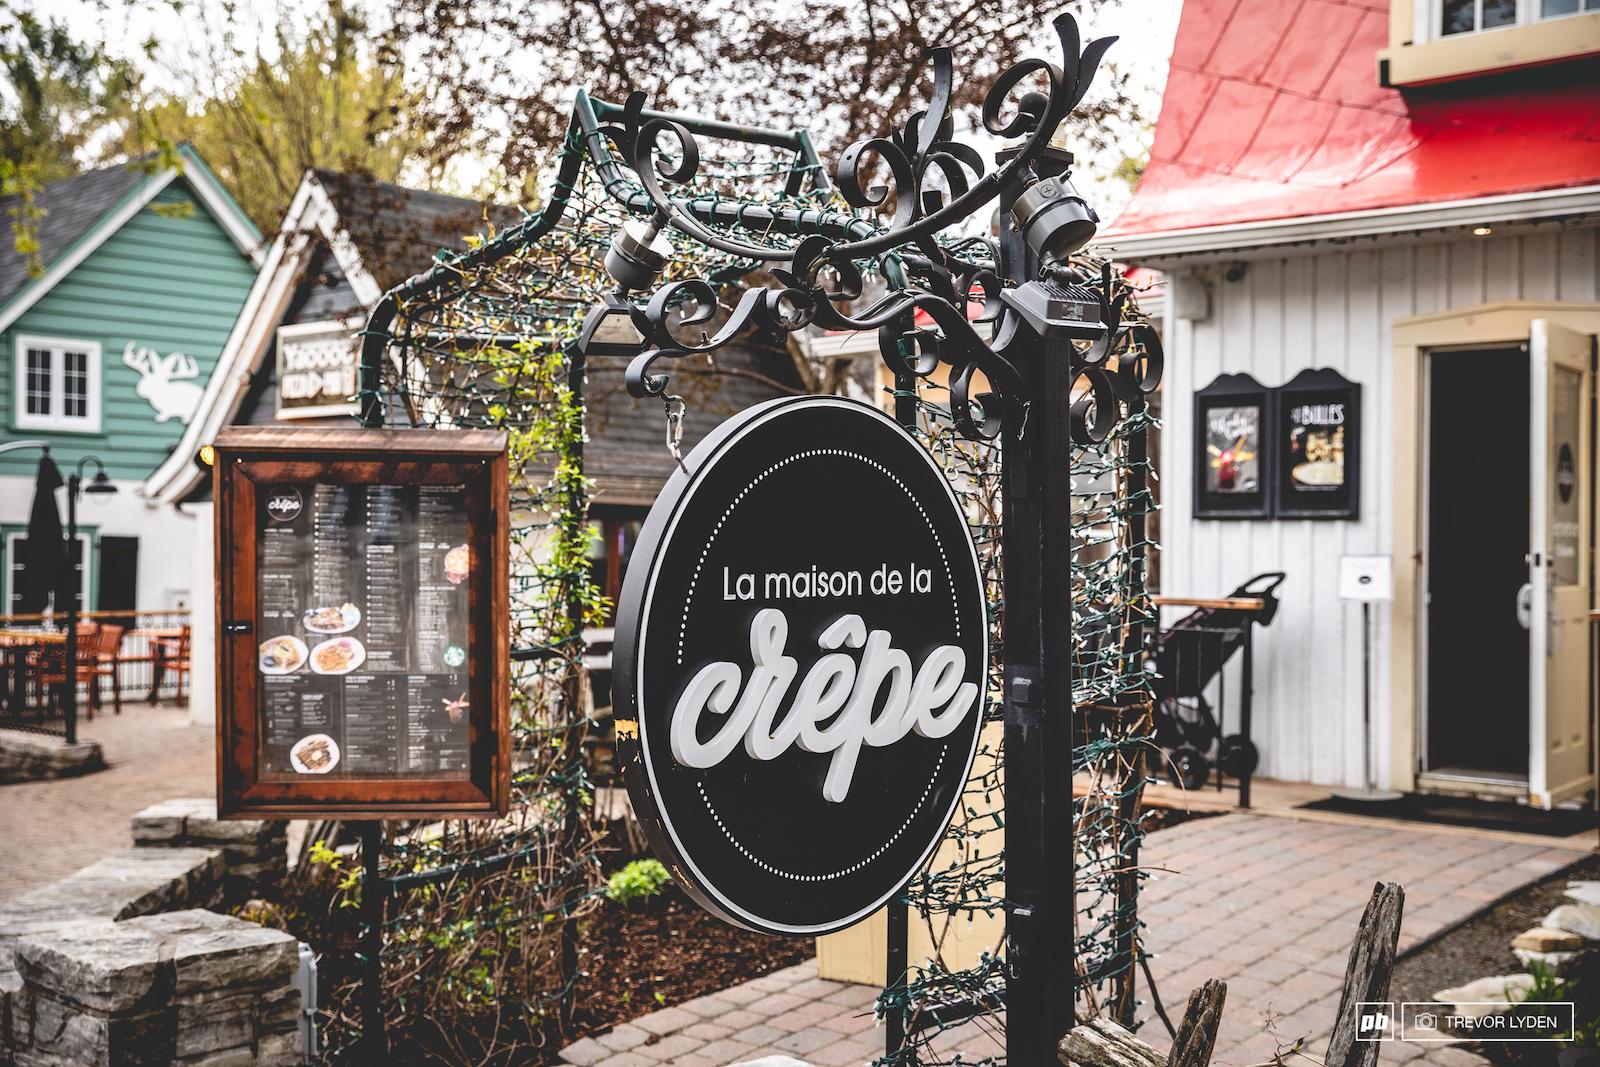 The best spot for breakfast in the village.